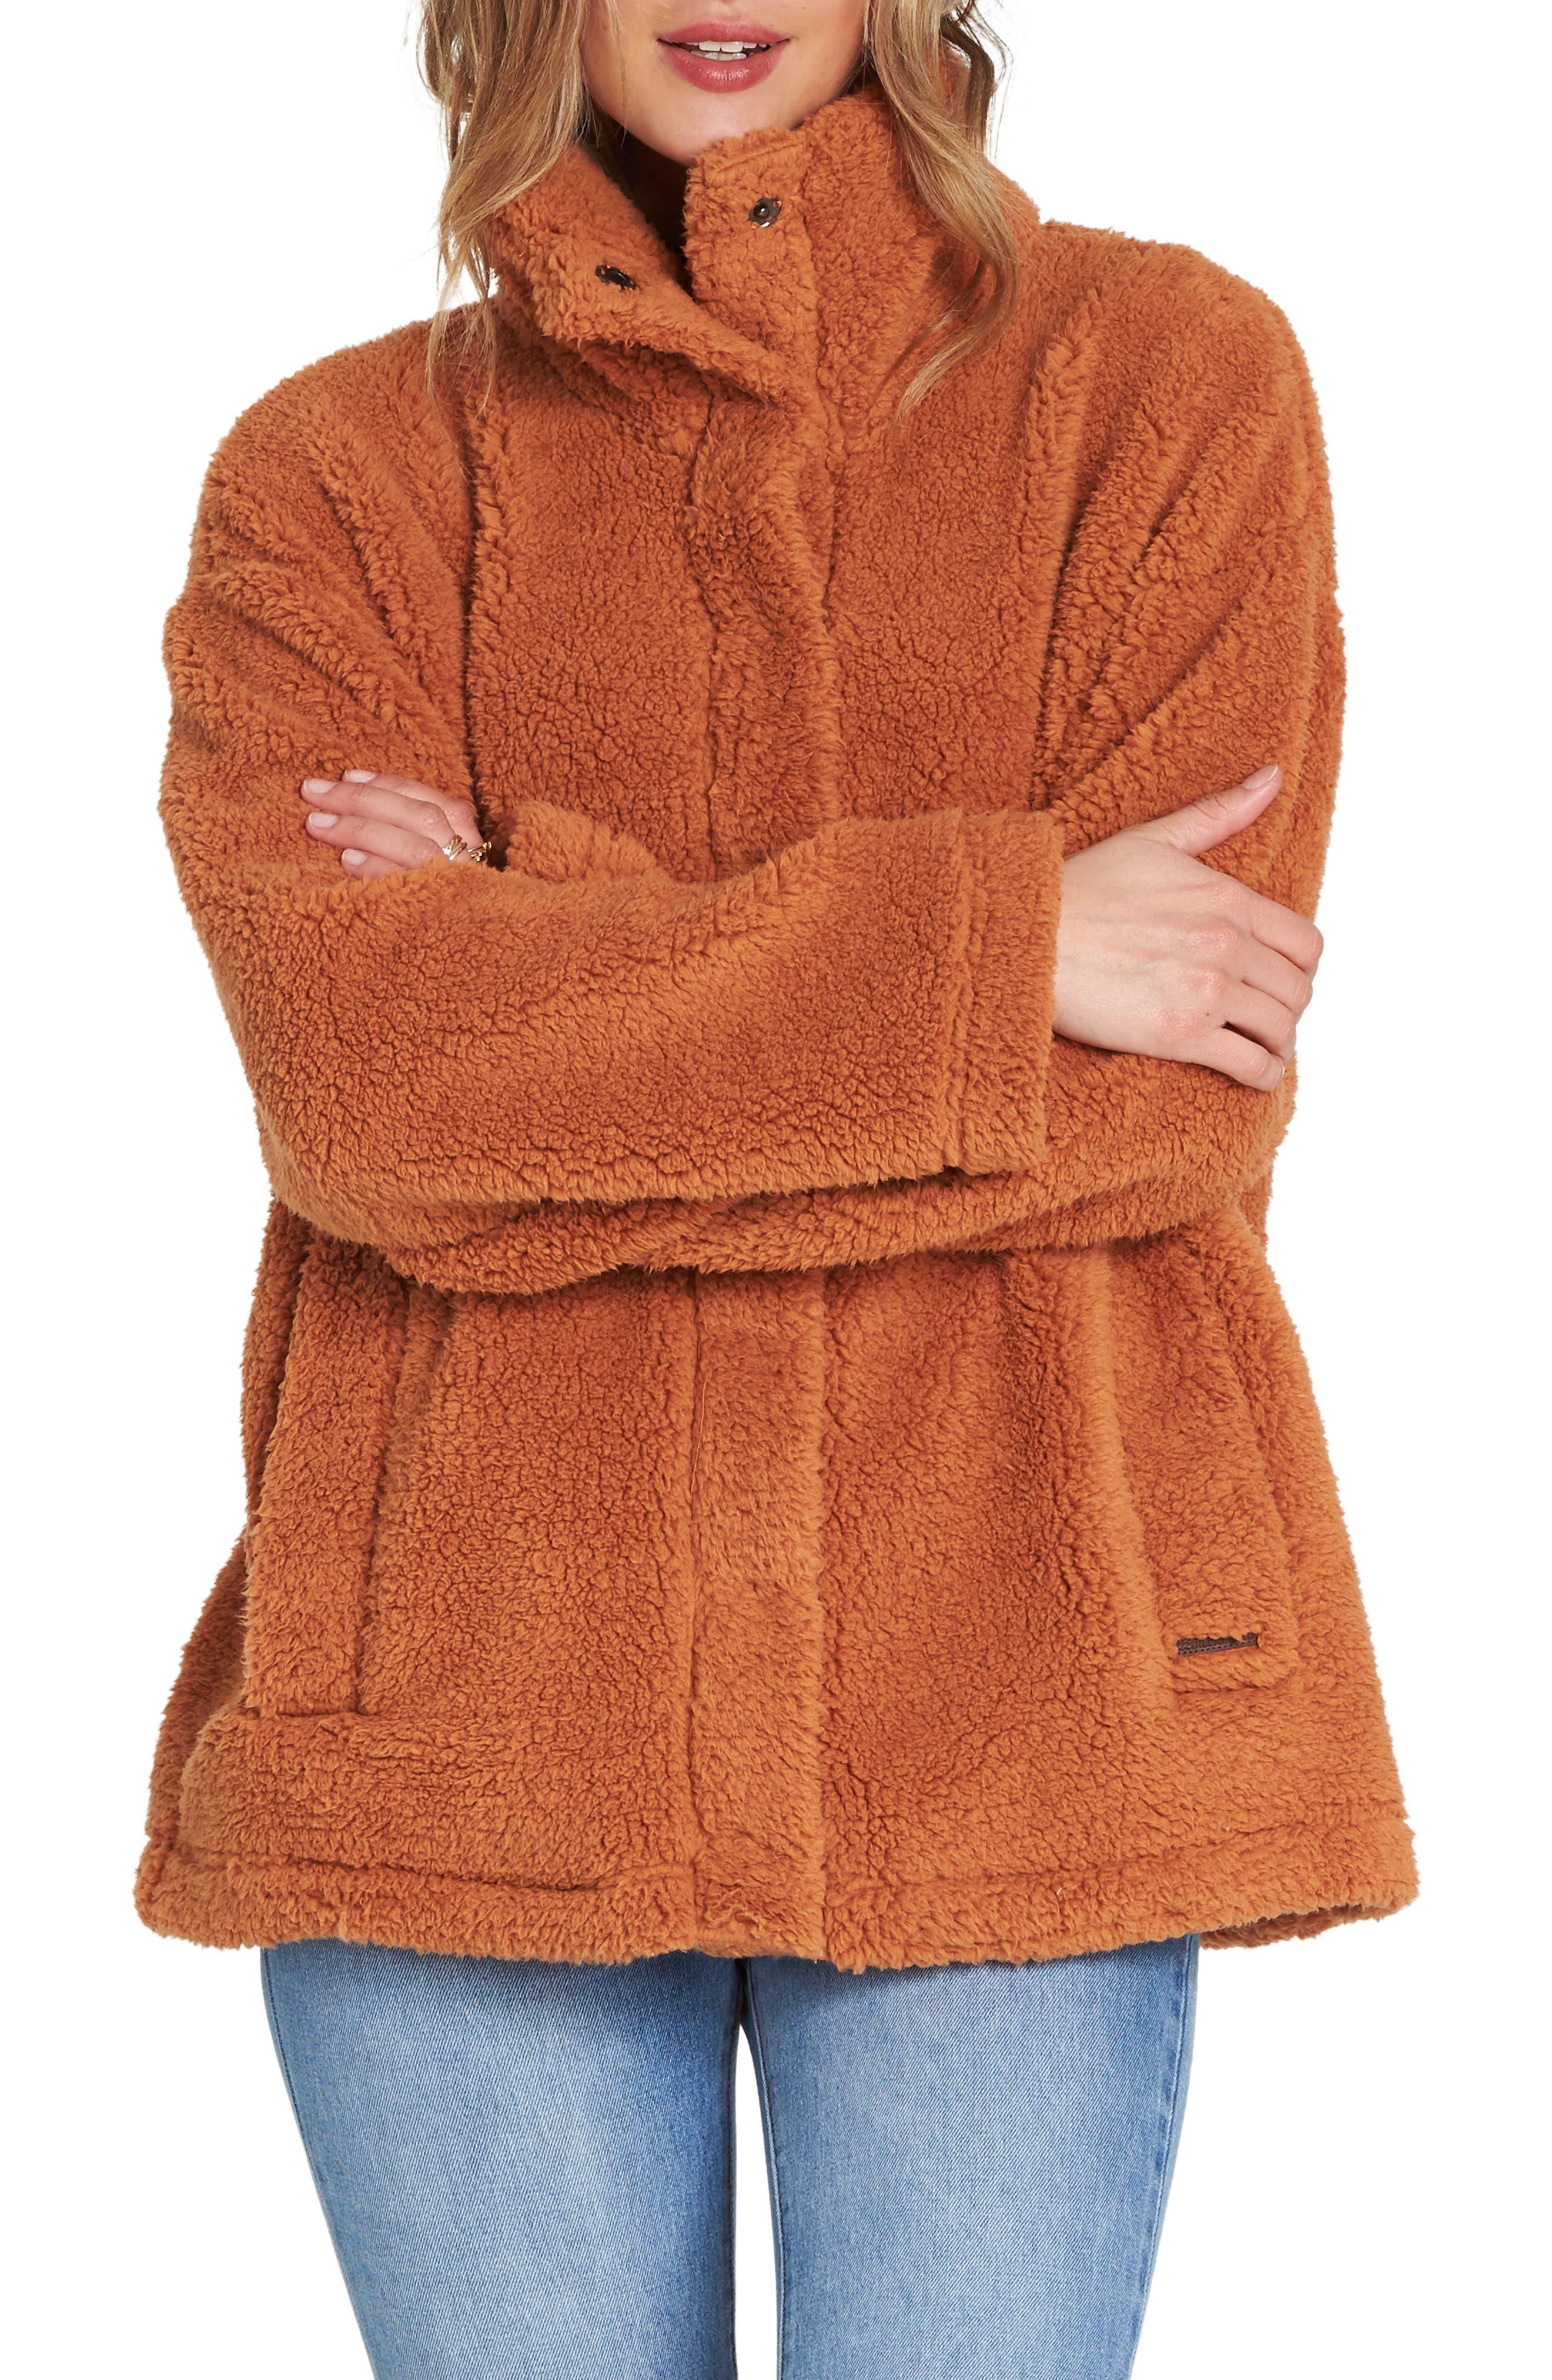 BILLABONG, Cozy Days Faux Fur Jacket, Main thumbnail 1, color, TOFFEE